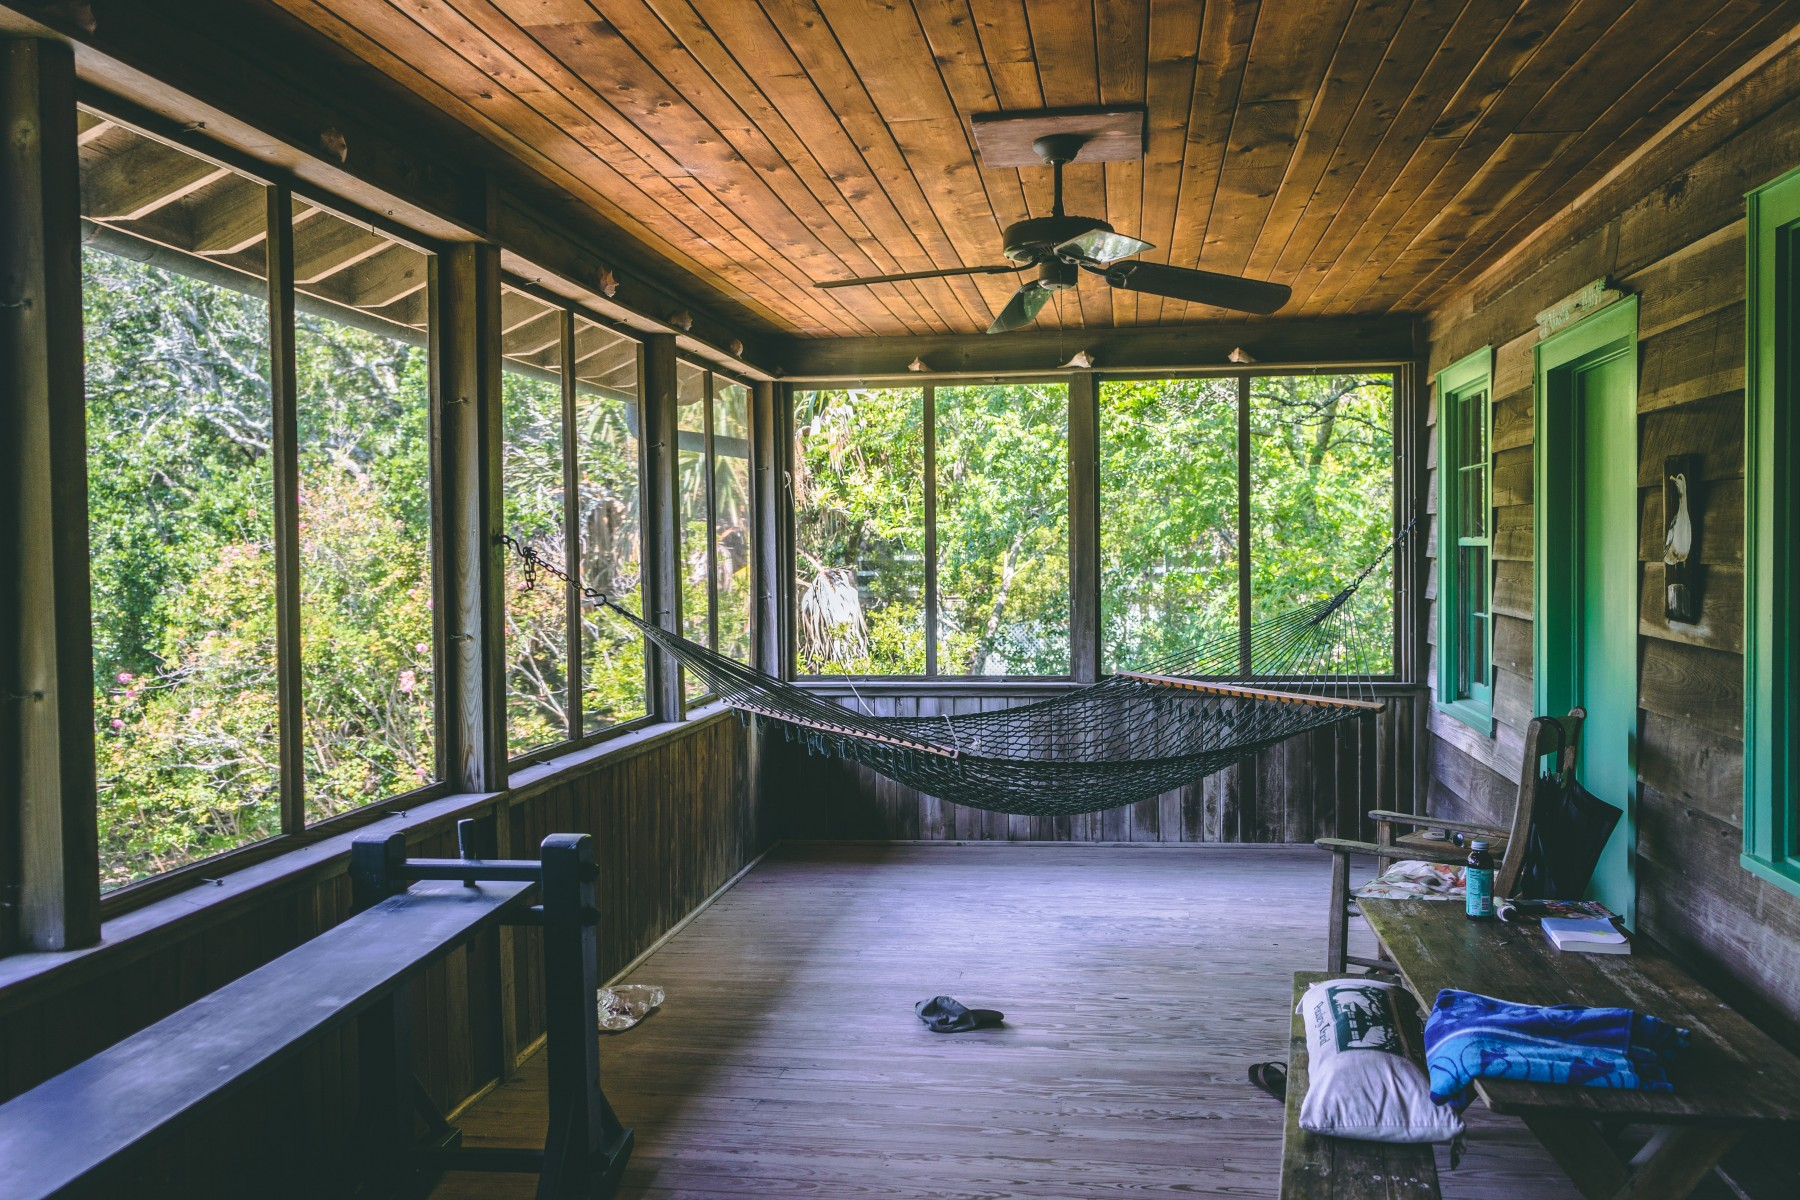 outdoor ceiling fan - Tim Kyle